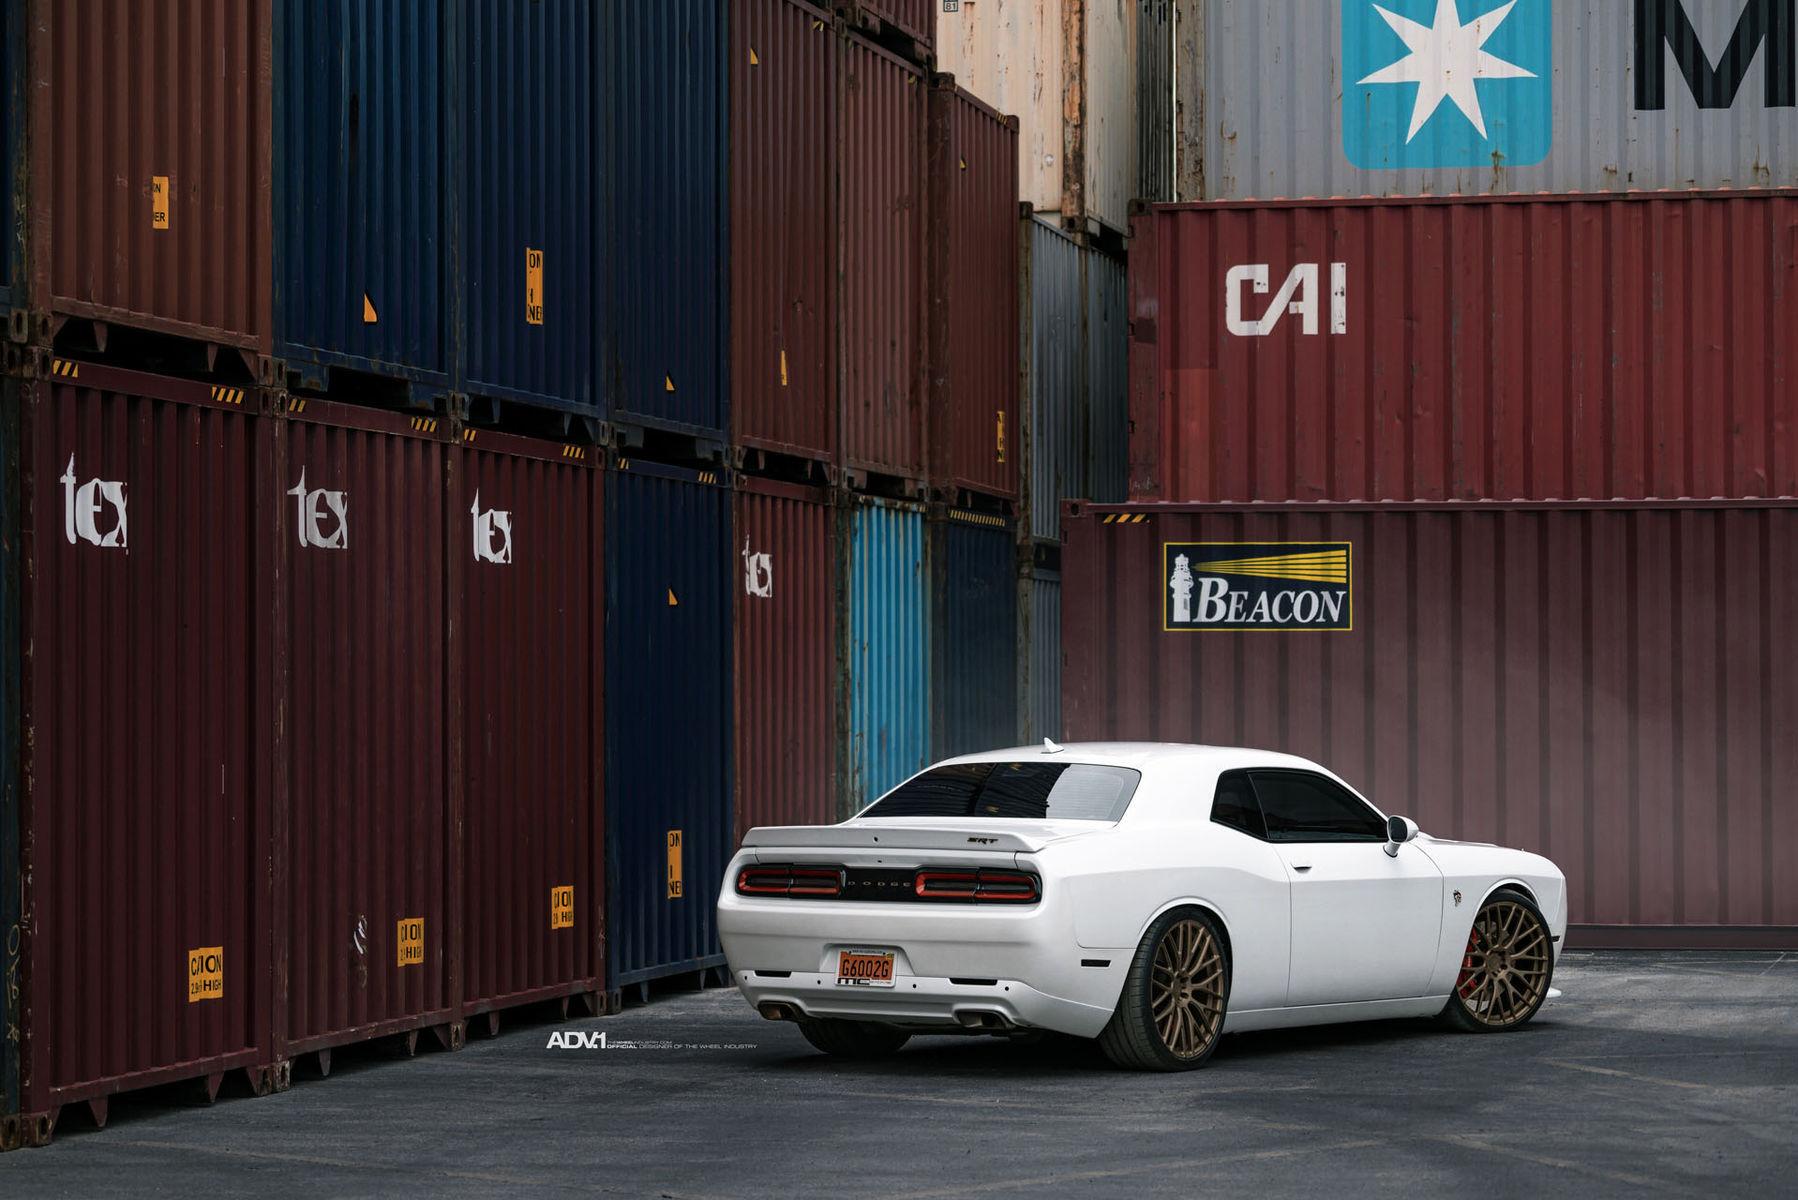 2015 Dodge Challenger | Dodge Challenger SRT Hellcat